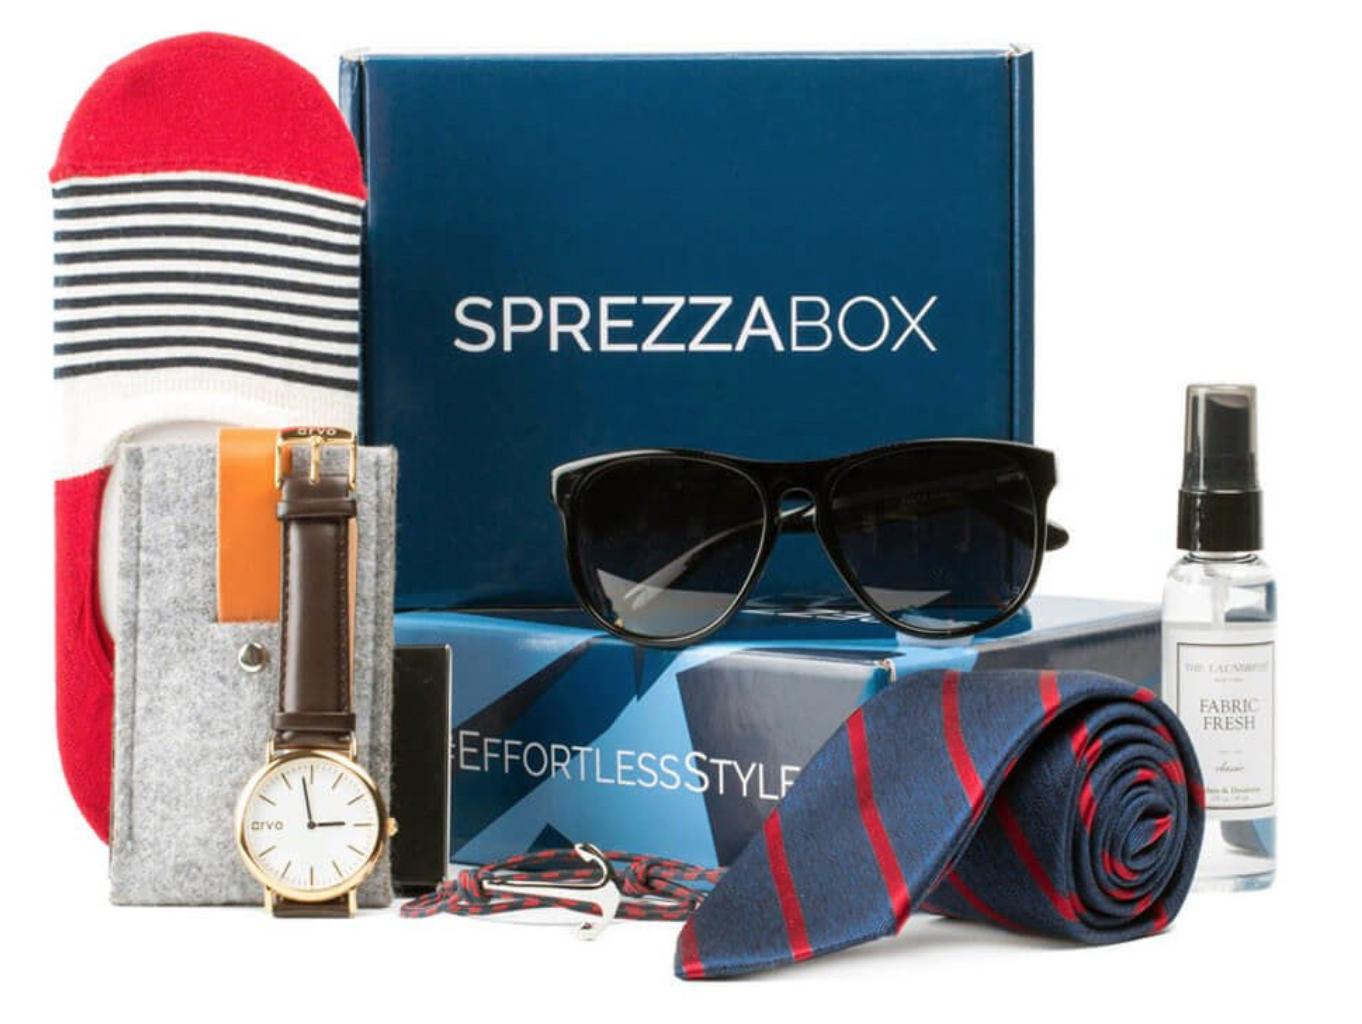 SprezzaBox May 2019 FULL Spoilers + Coupon!